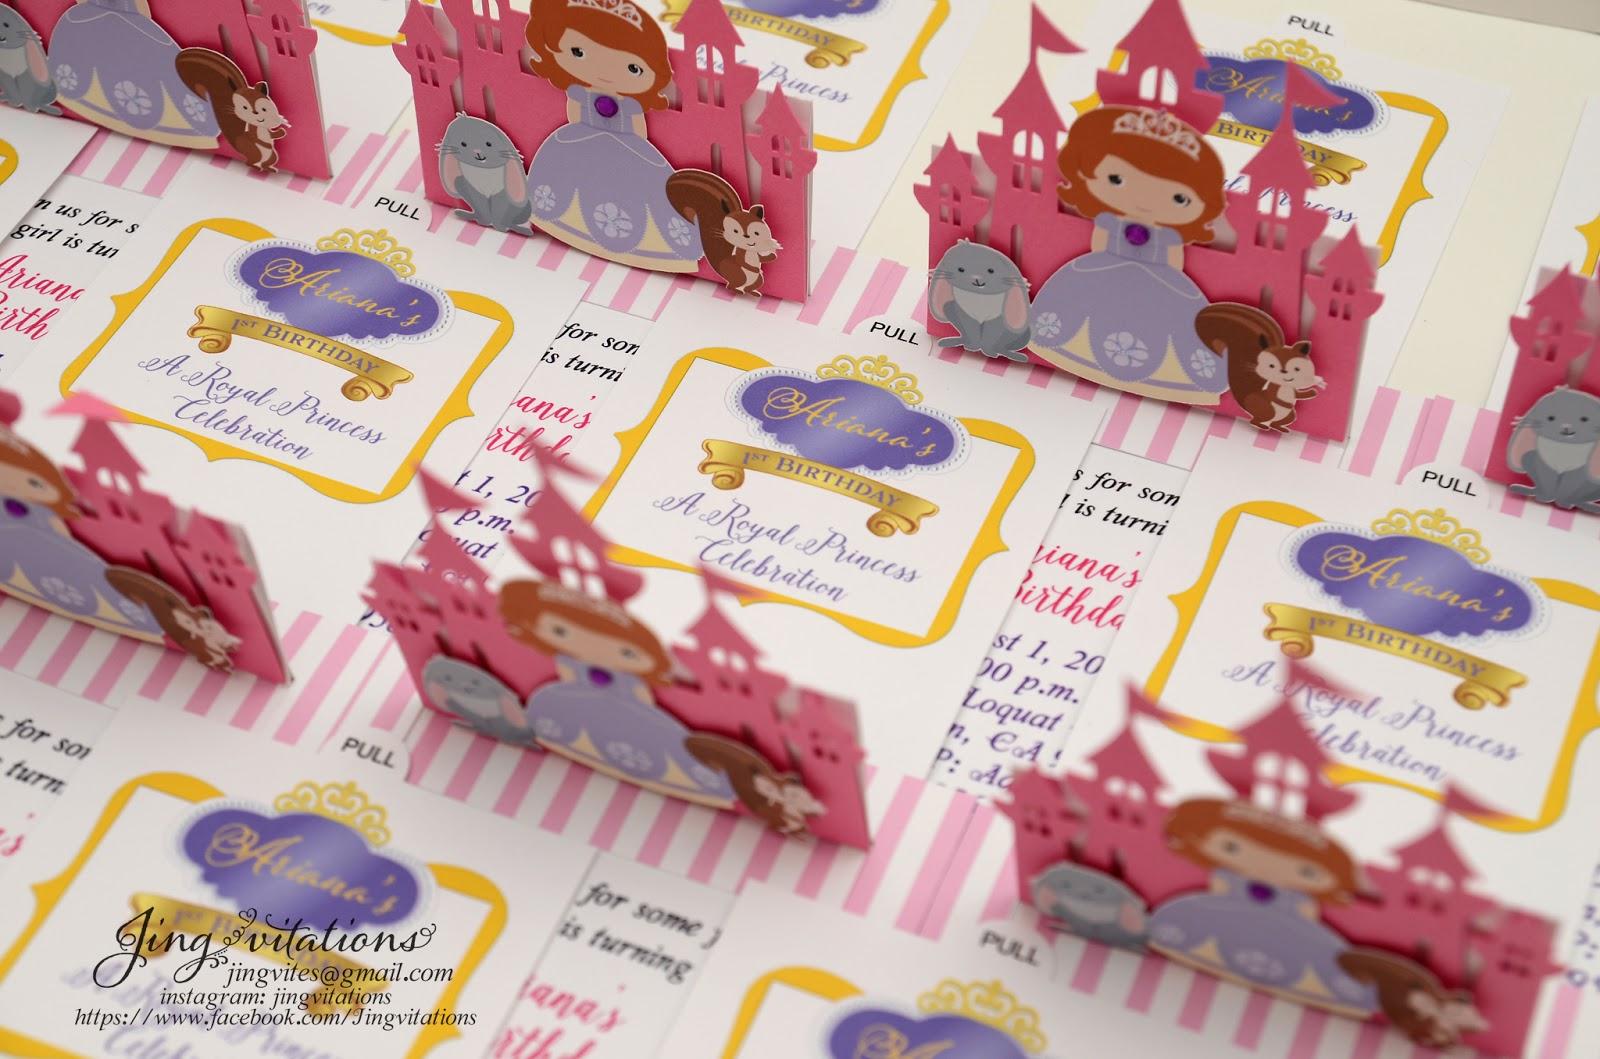 Jingvitations: birthday invitations